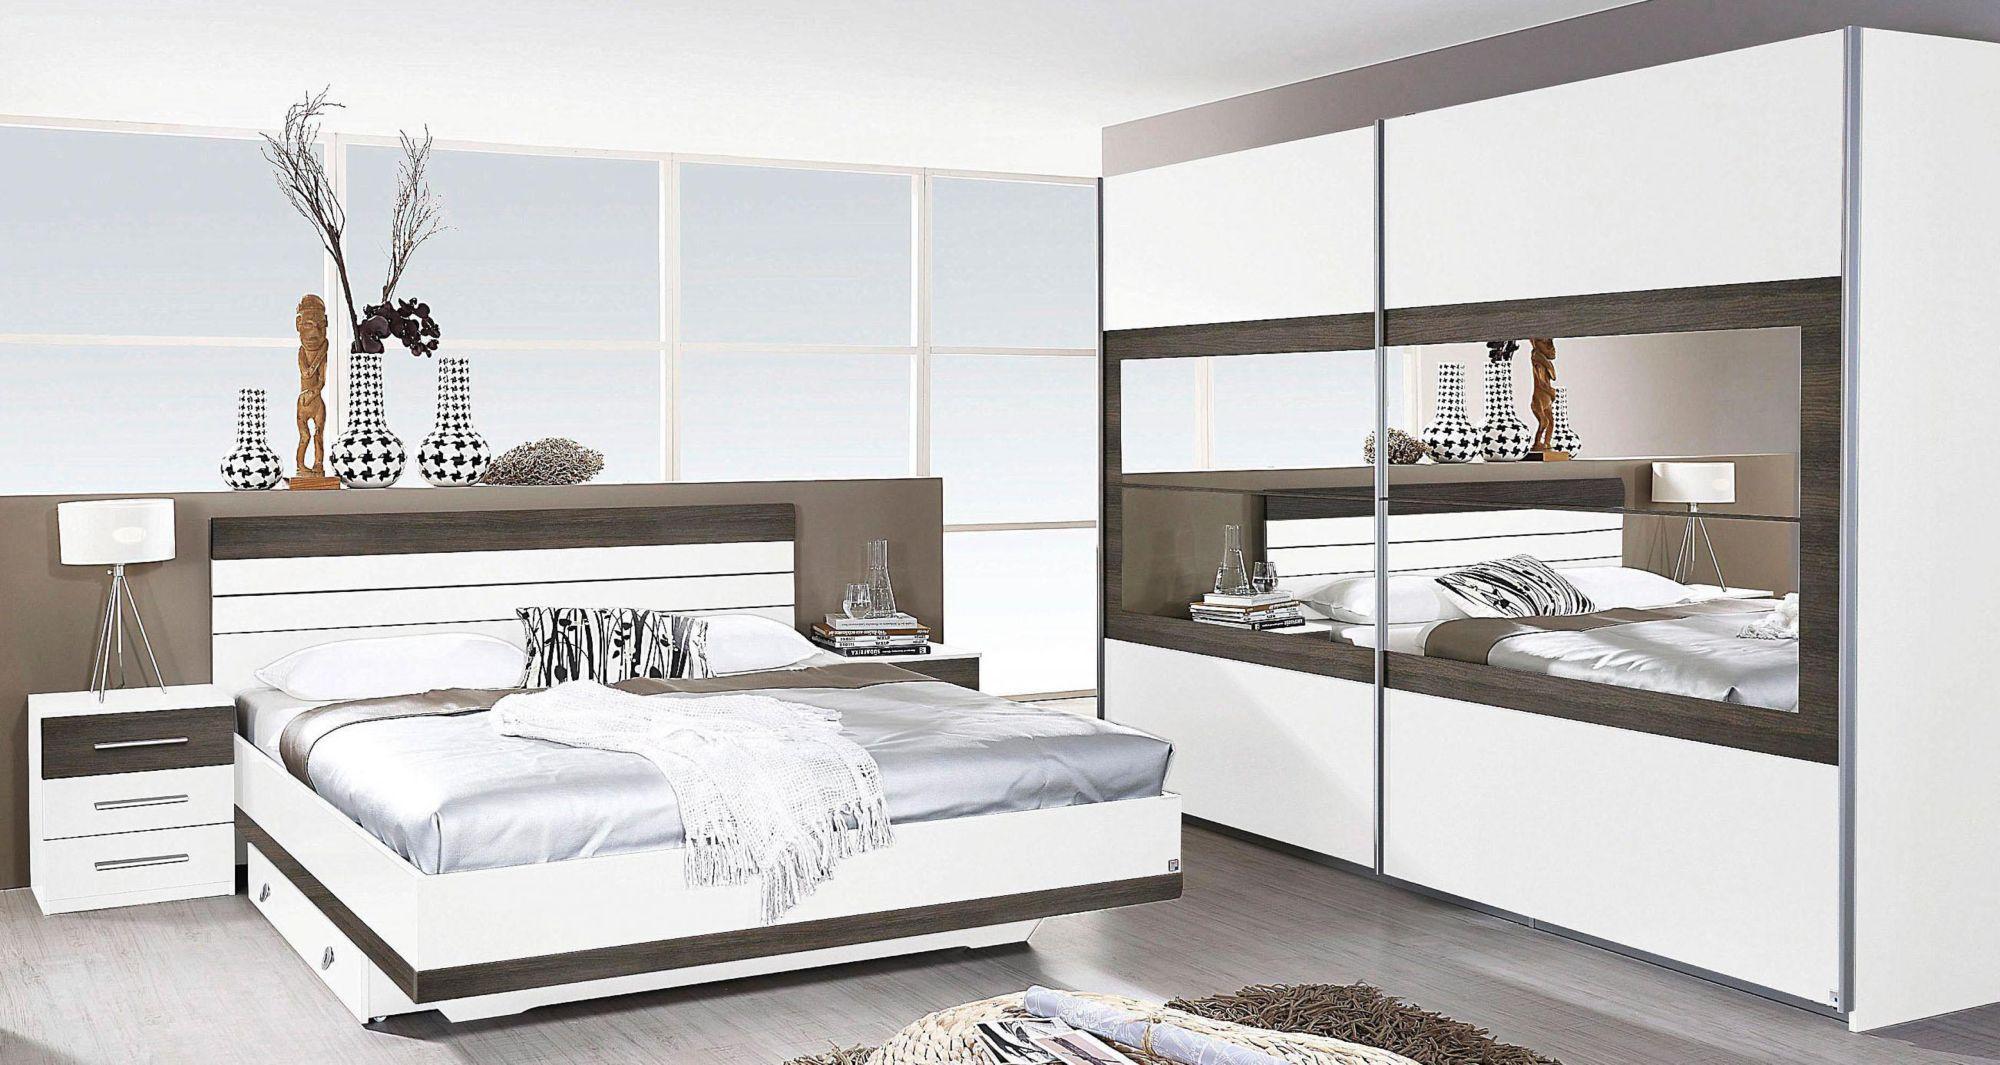 bueromoebel programme g nstig online kaufen beim schwab versand. Black Bedroom Furniture Sets. Home Design Ideas